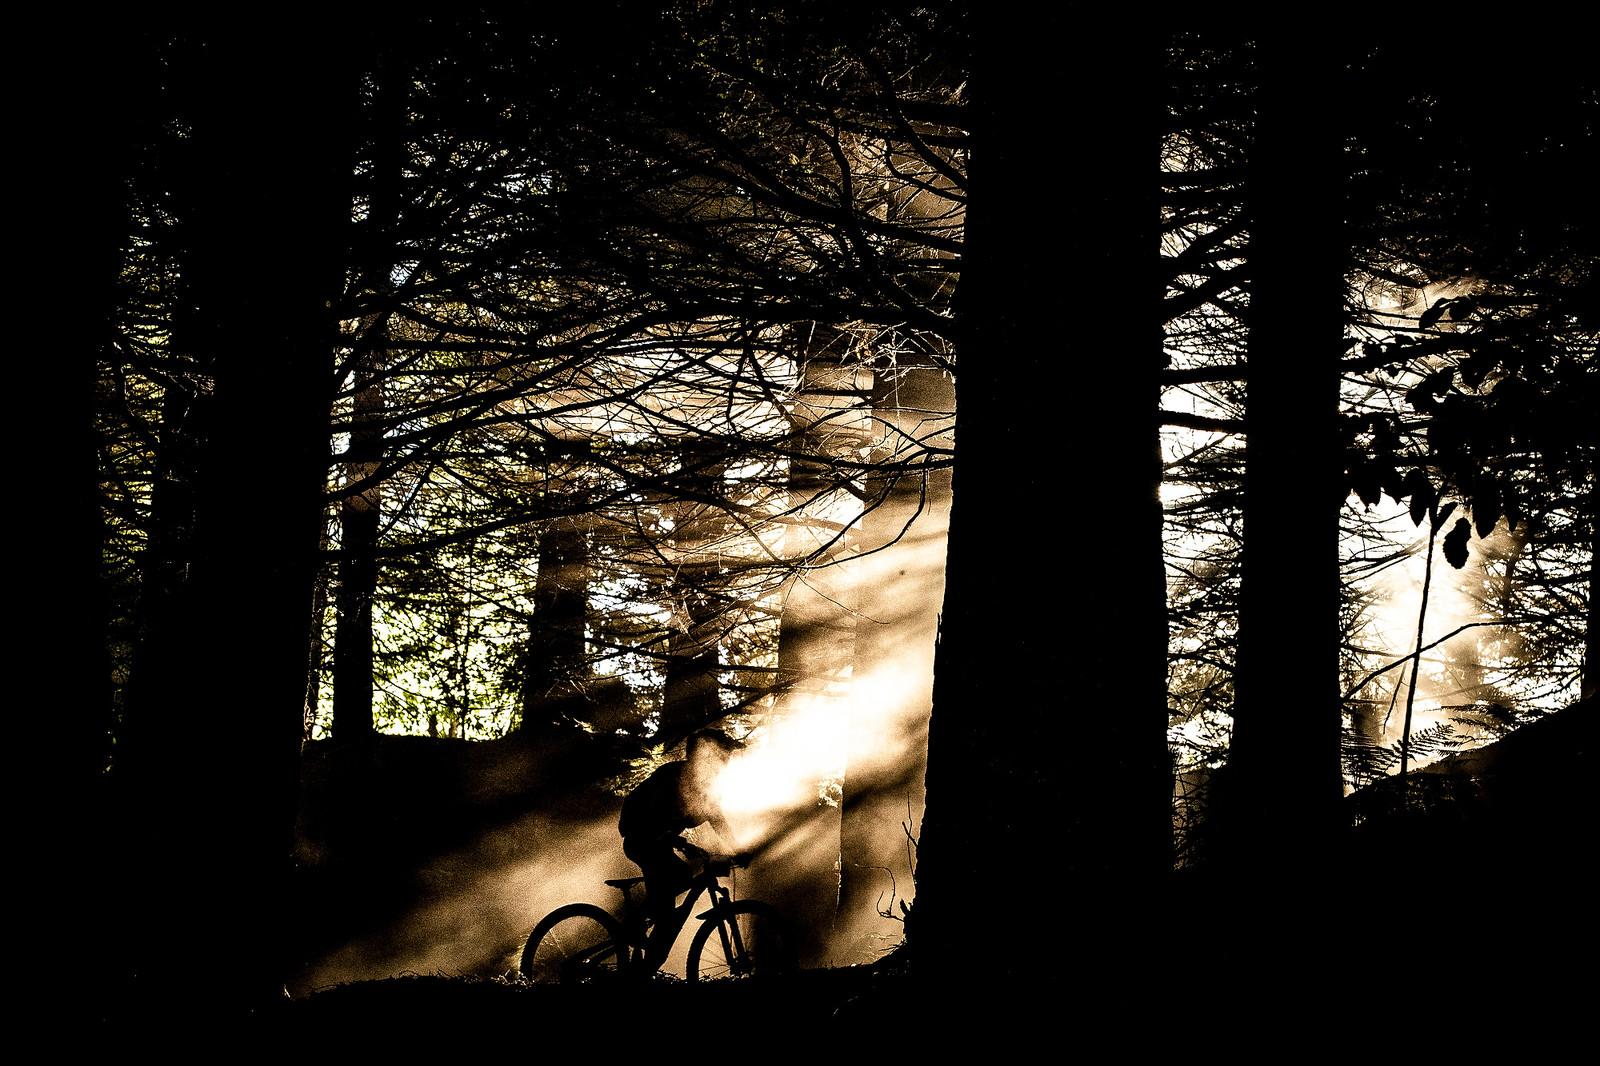 Dry, Dusty Rotorua - 2019 Enduro World Series Crankworx Rotorua - Mountain Biking Pictures - Vital MTB